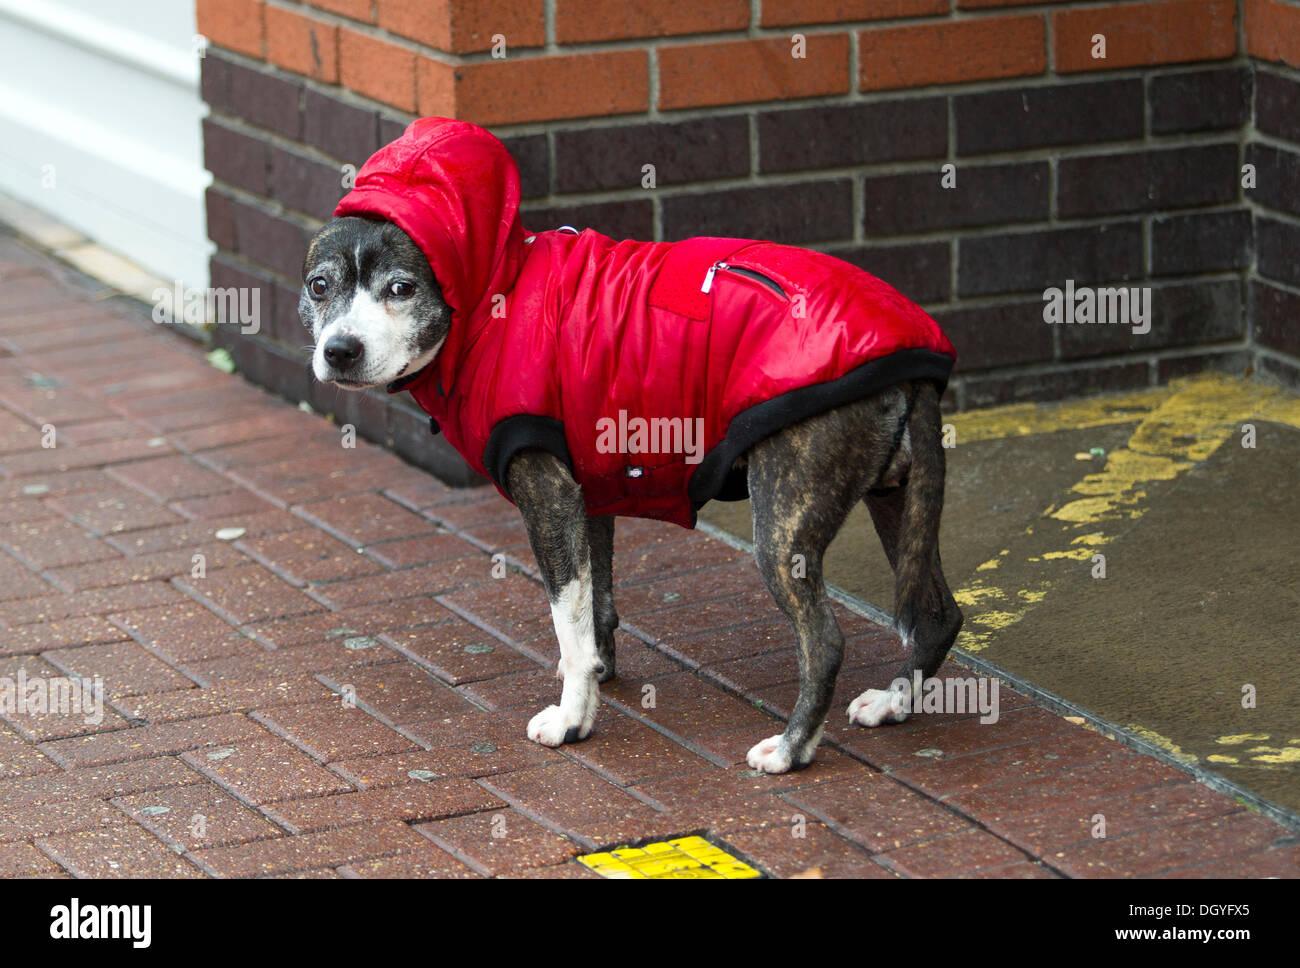 28.10.2013 7,59 bin Hund in einen Regenmantel, Southend-on-sea High Street Stockbild